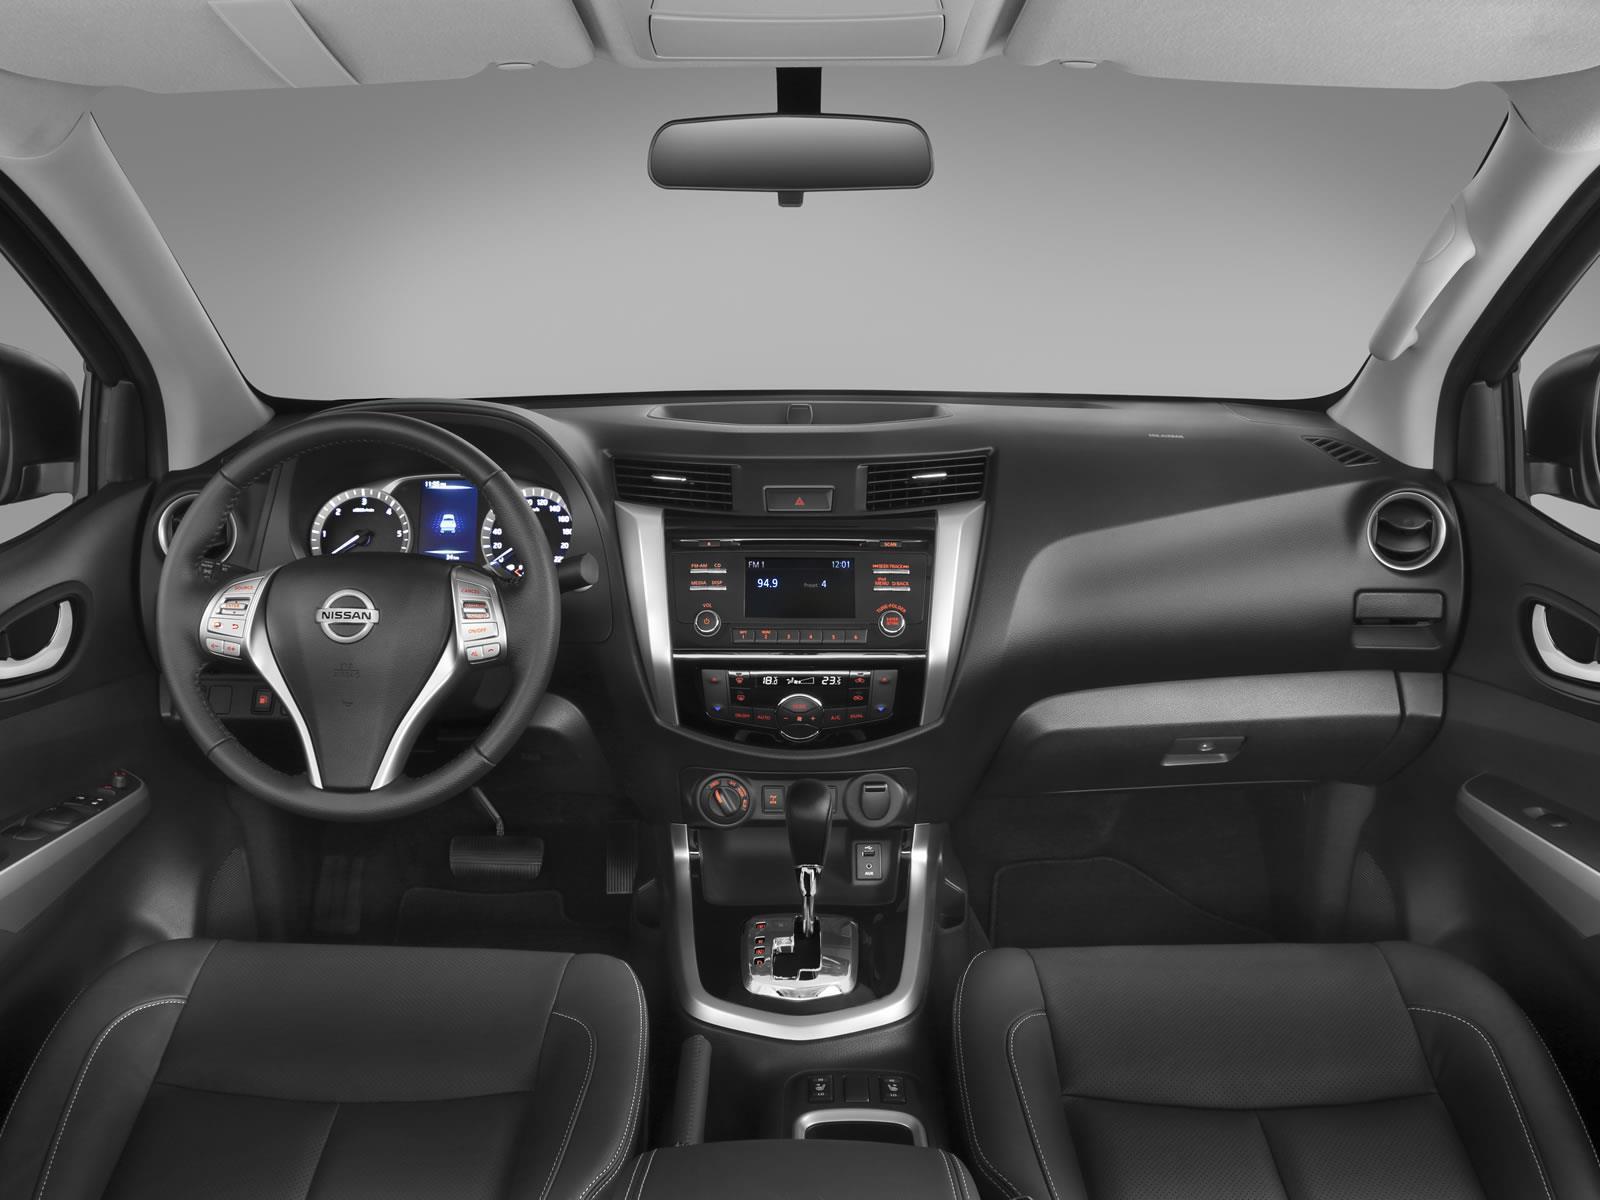 Nissan Np300 Frontier Di 233 Sel 2017 Llega A M 233 Xico Desde